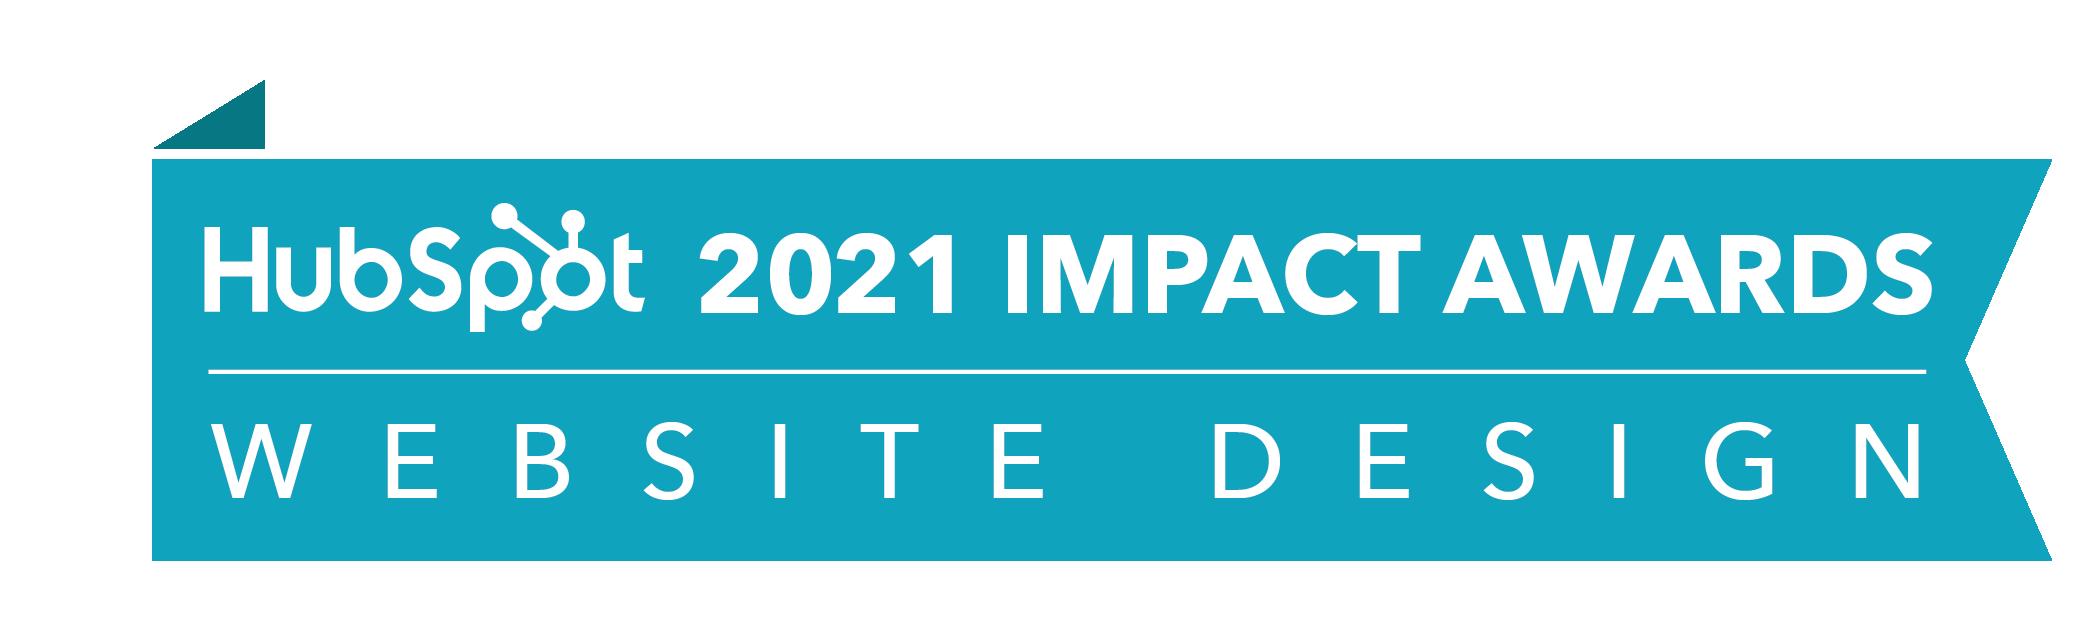 HubSpot_ImpactAwards_2021_WebsiteDesign2-1